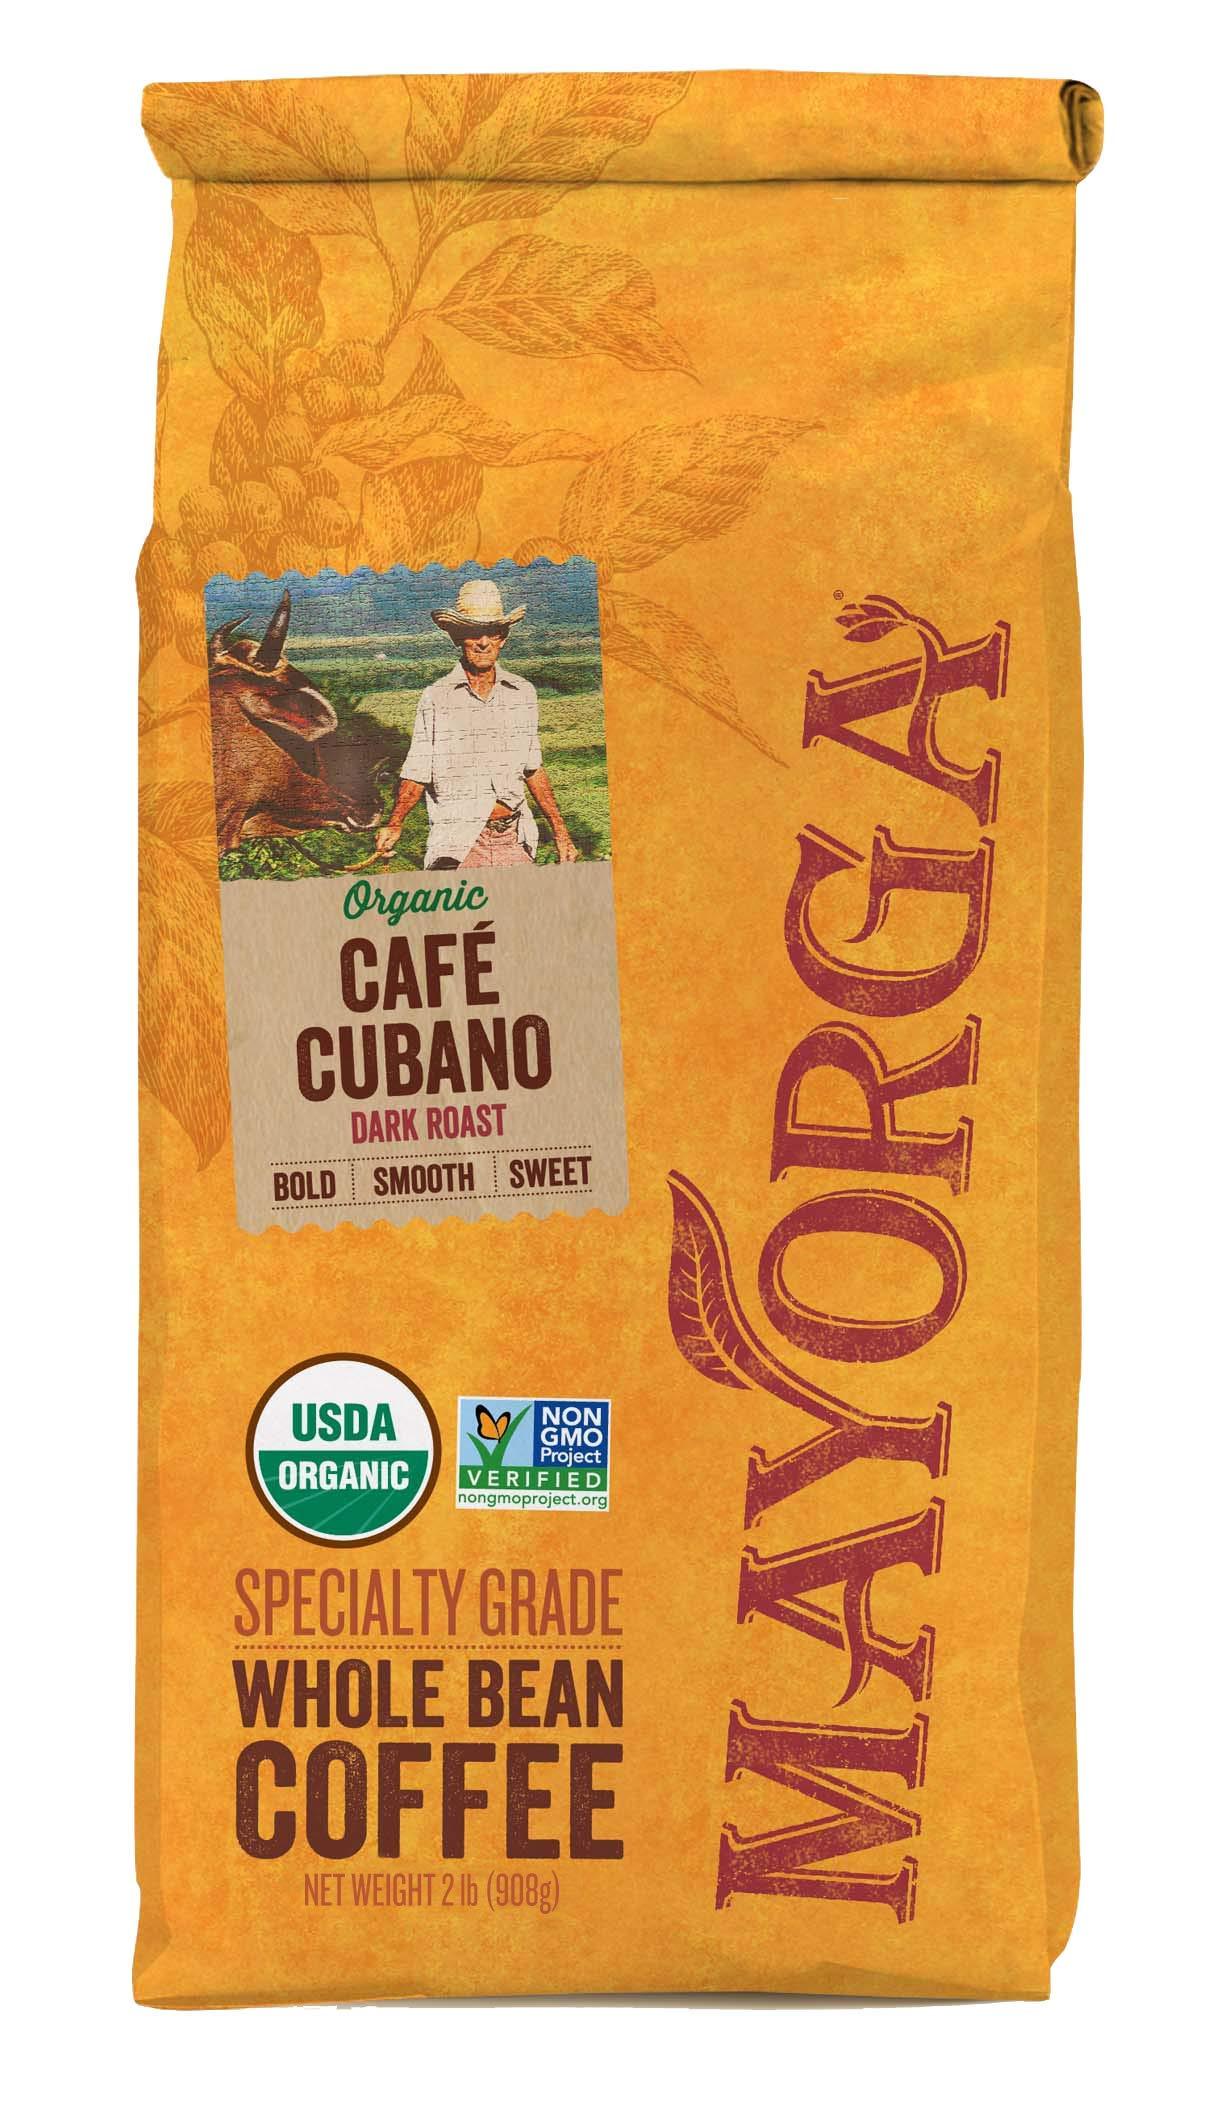 Mayorga Organics Cafe Cubano Dark Roast, 2 Pound, Whole Bean Coffee, Direct Trade, 100% USDA Organic Certified, Non-GMO, Kosher by Mayorga Organics